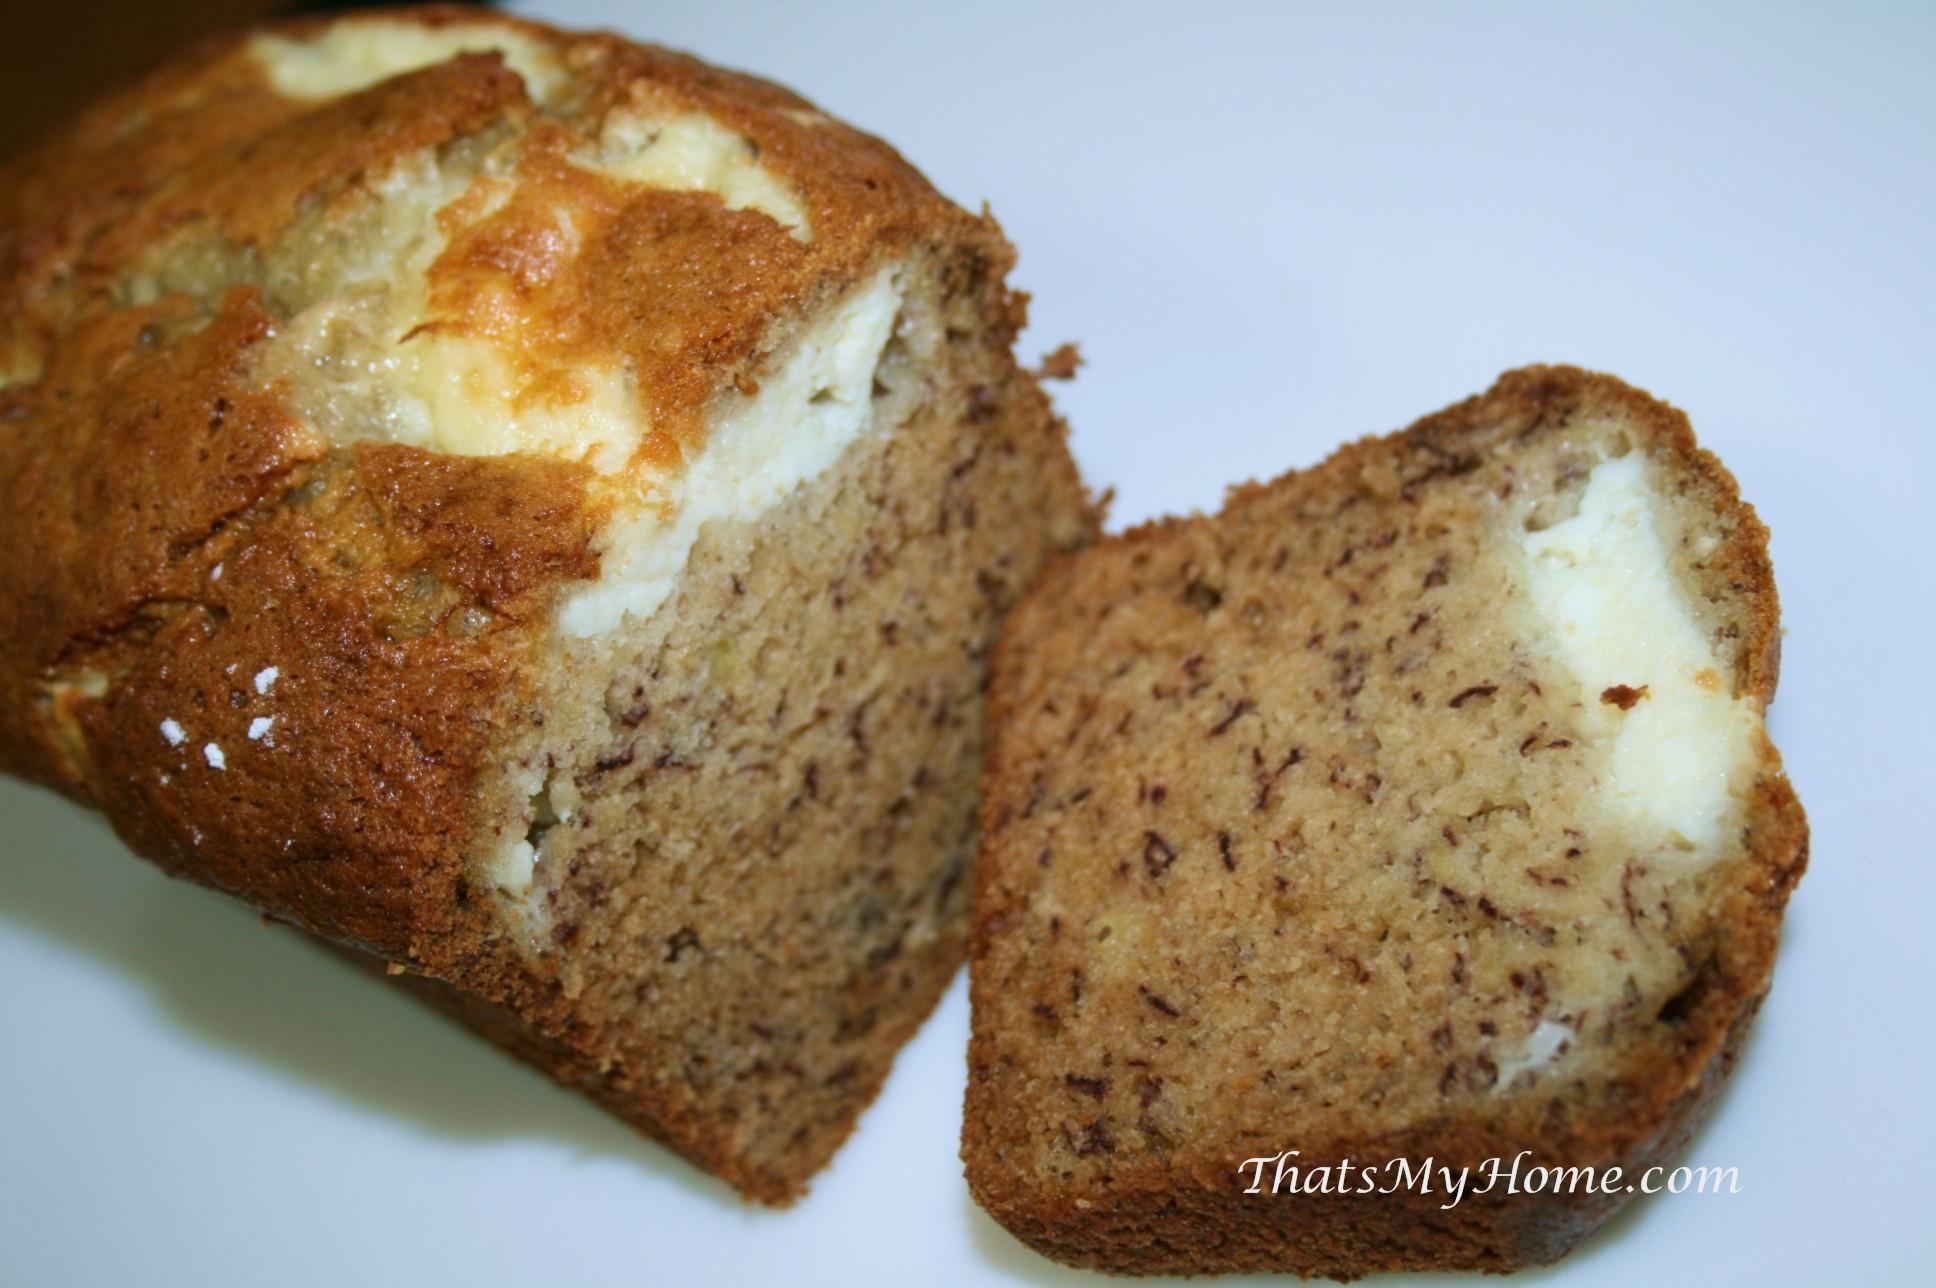 Banana Cream Cheese Bread  Banana Cream Cheese Bread Recipes Food and Cooking